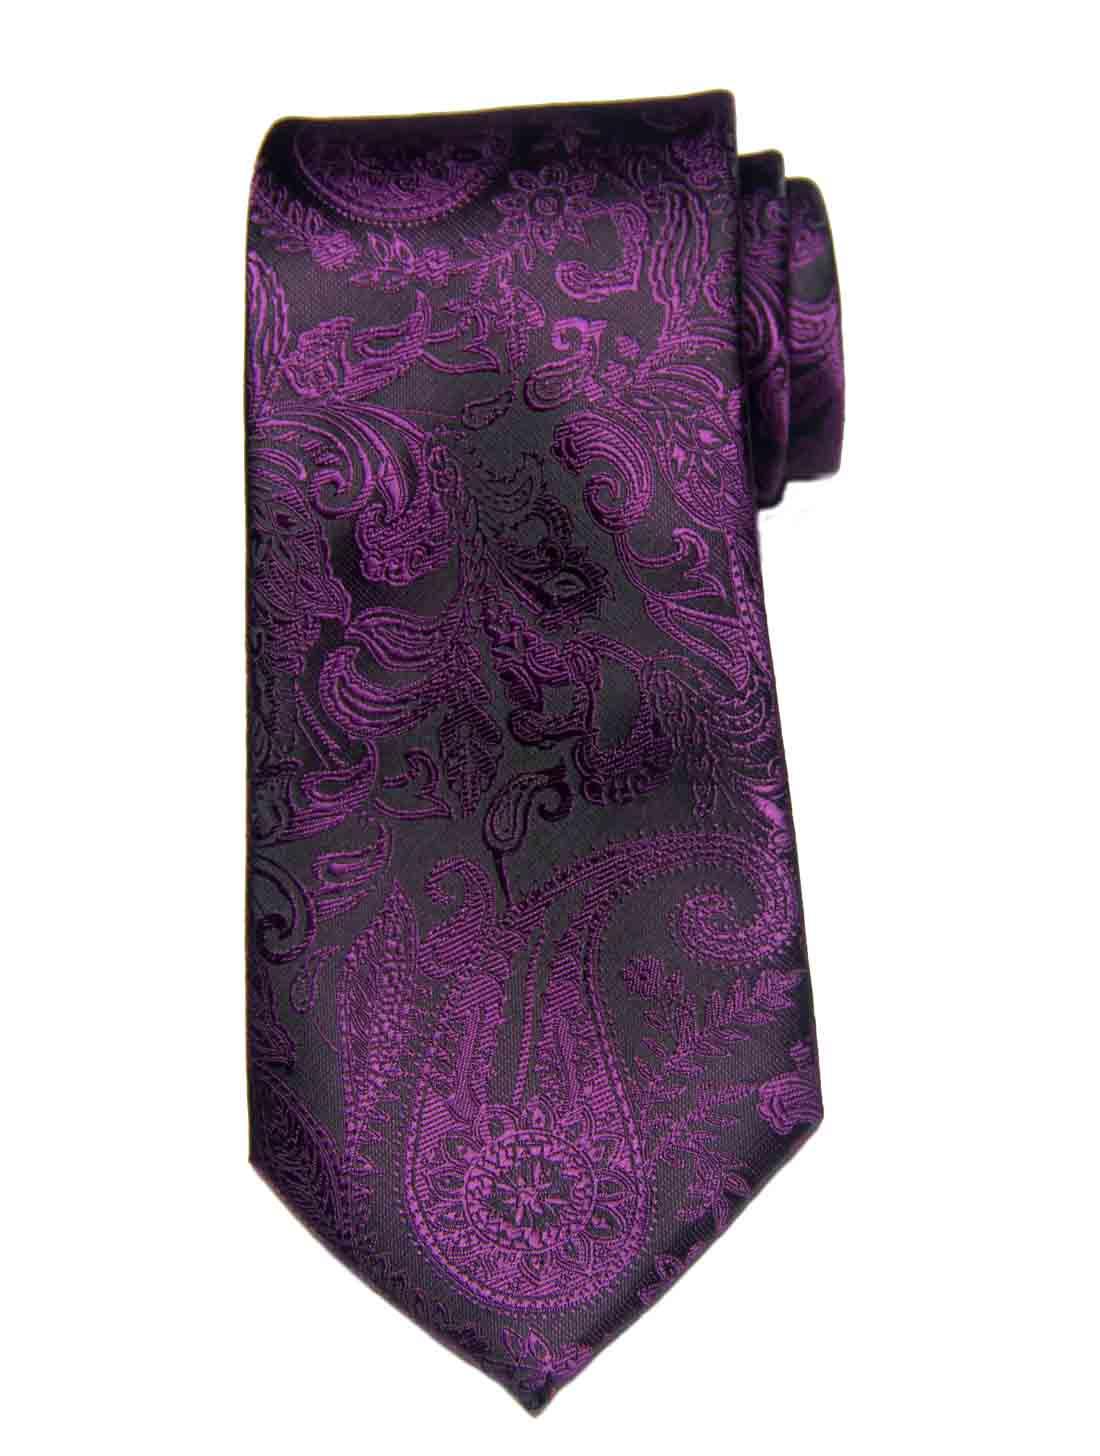 Gascoigne Silk Jacquard Tie Purple Black Paisley Pattern Men's